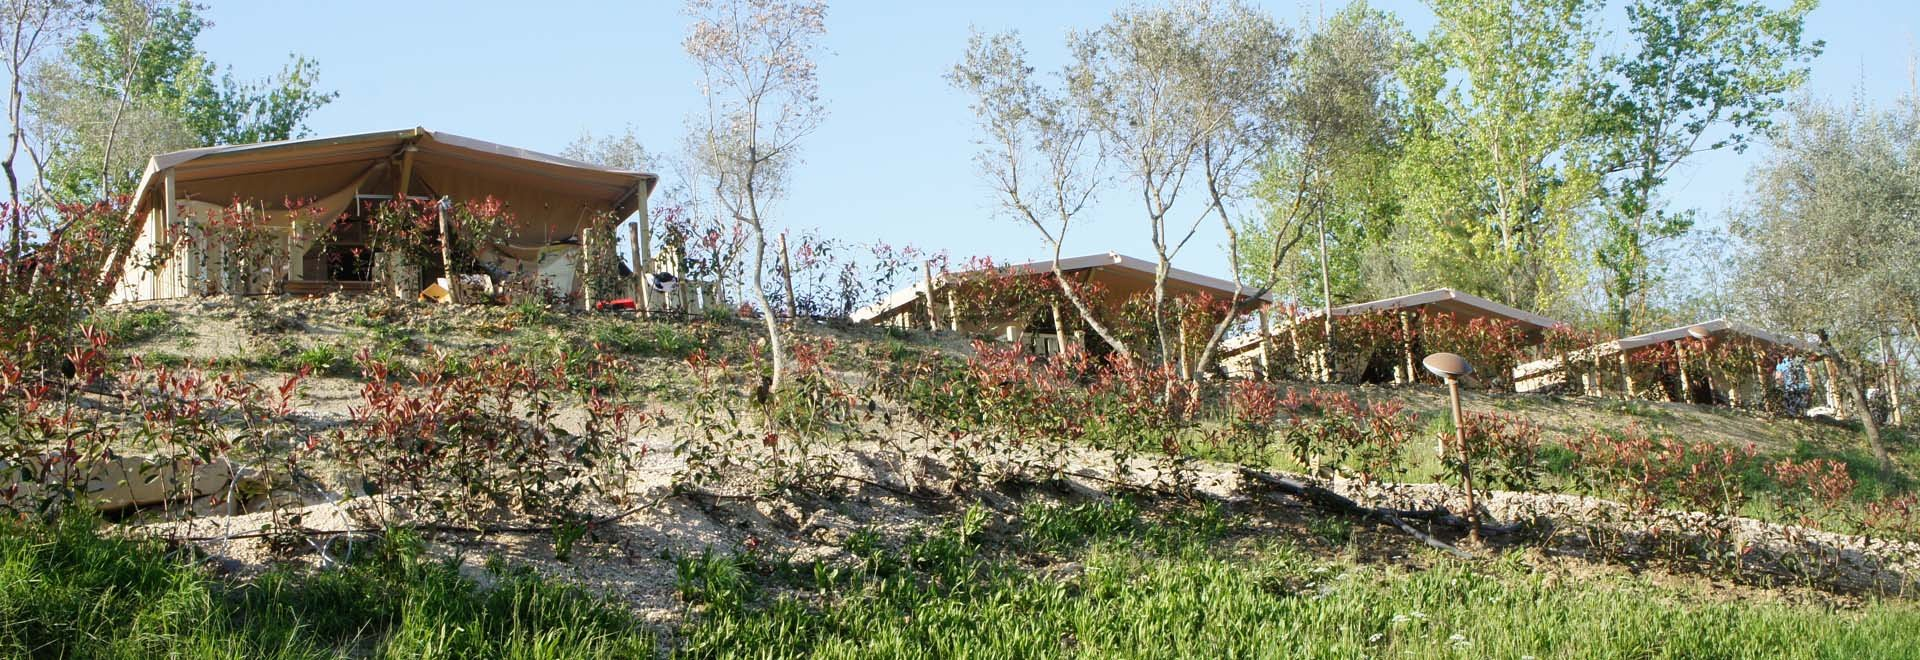 Luxe Tenten Banner Foto Norcenni Girasole Club